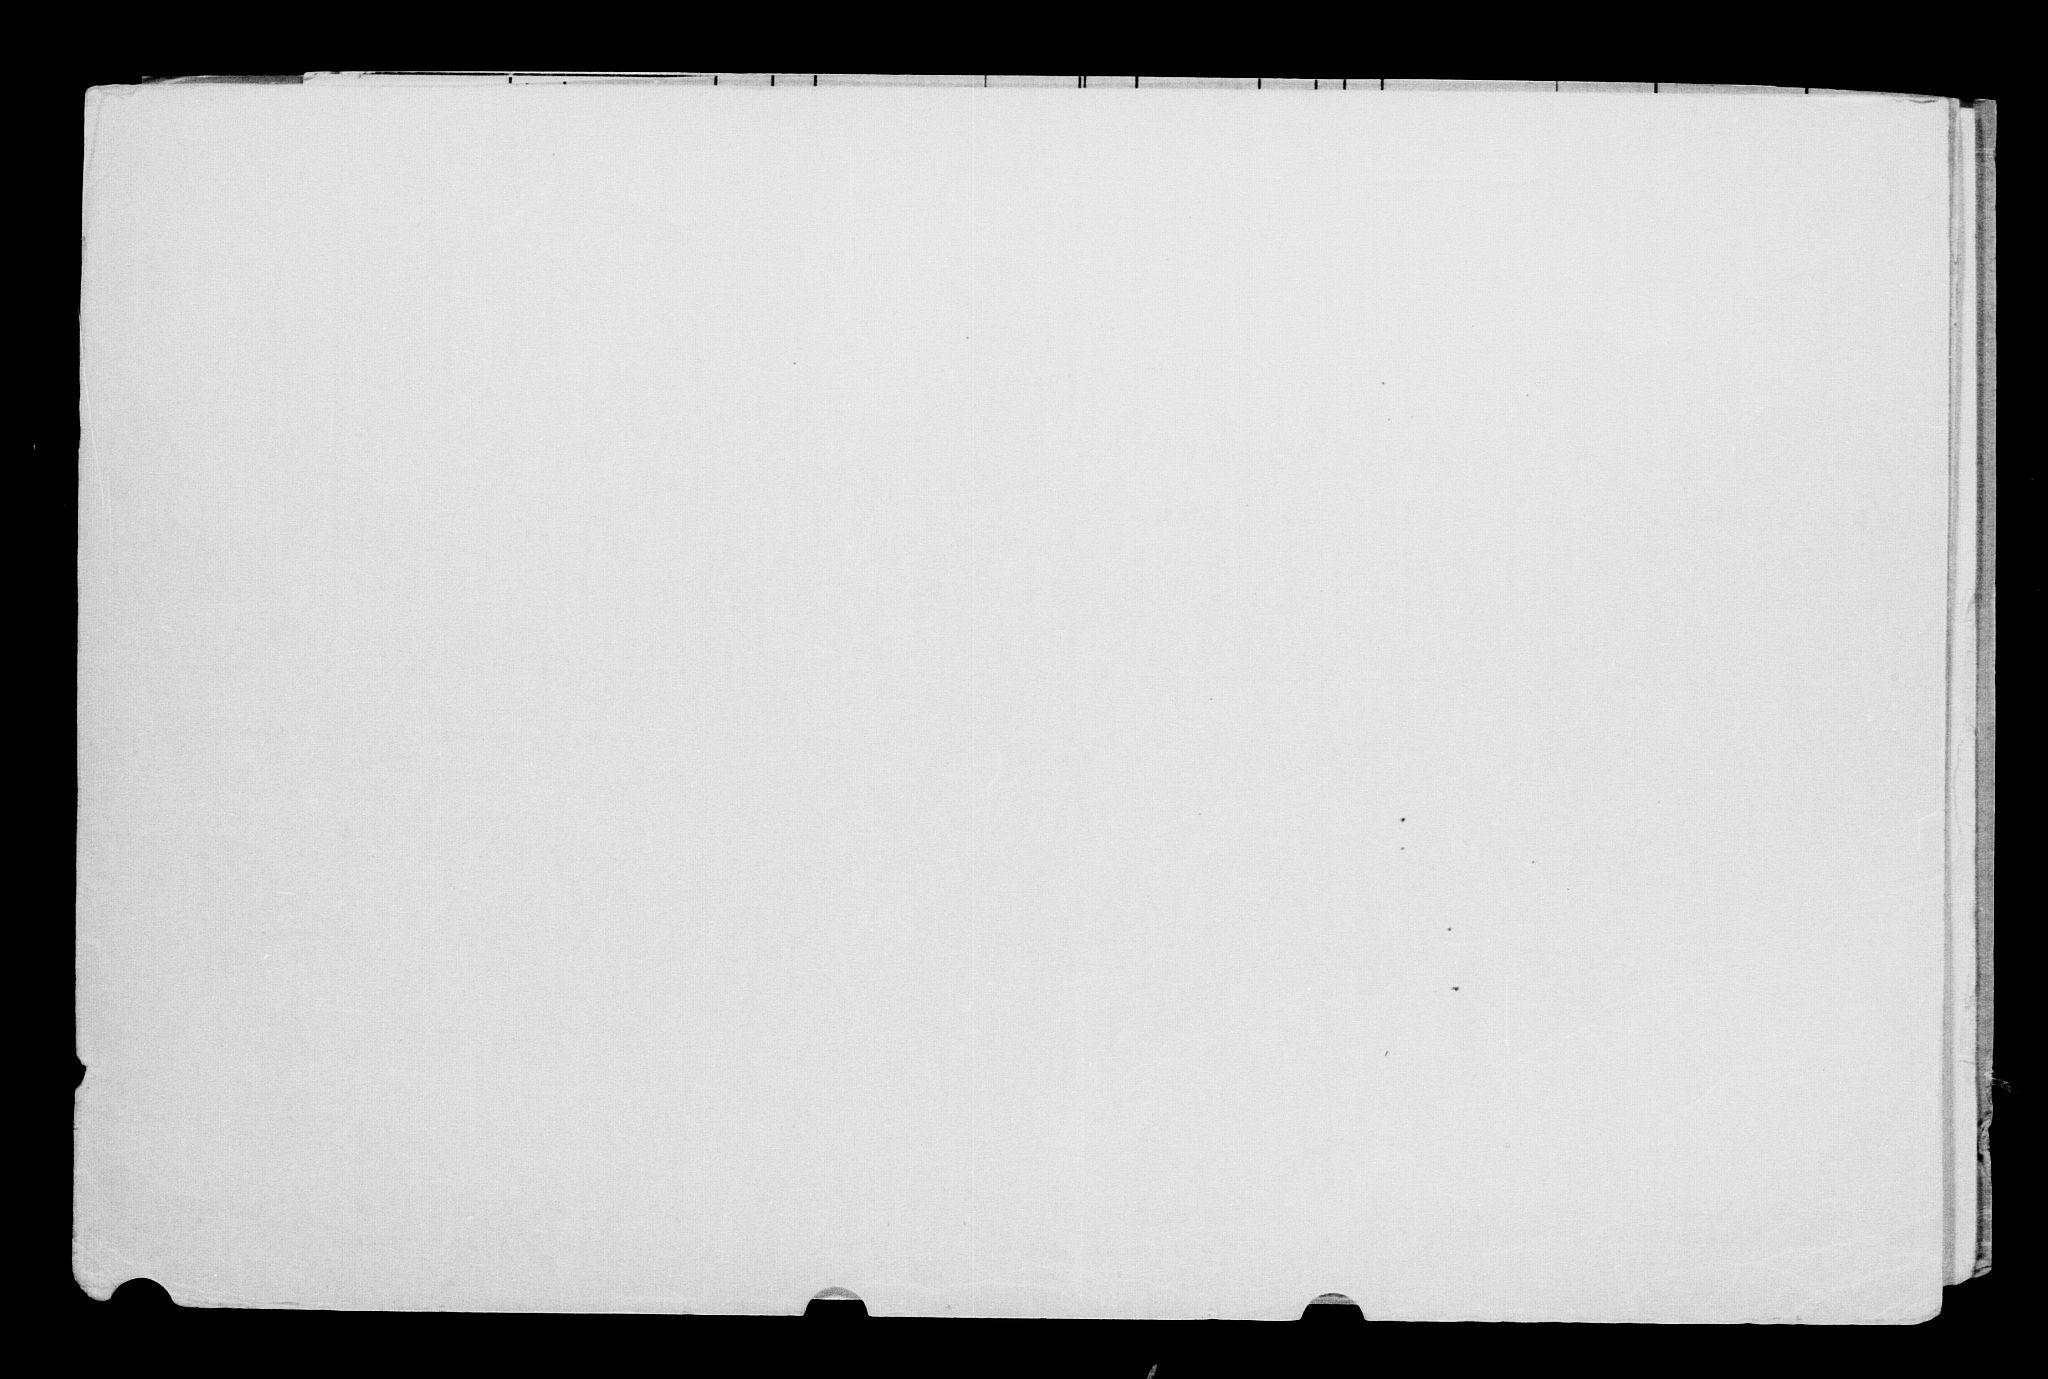 RA, Direktoratet for sjømenn, G/Gb/L0005: Hovedkort, 1888, s. 208